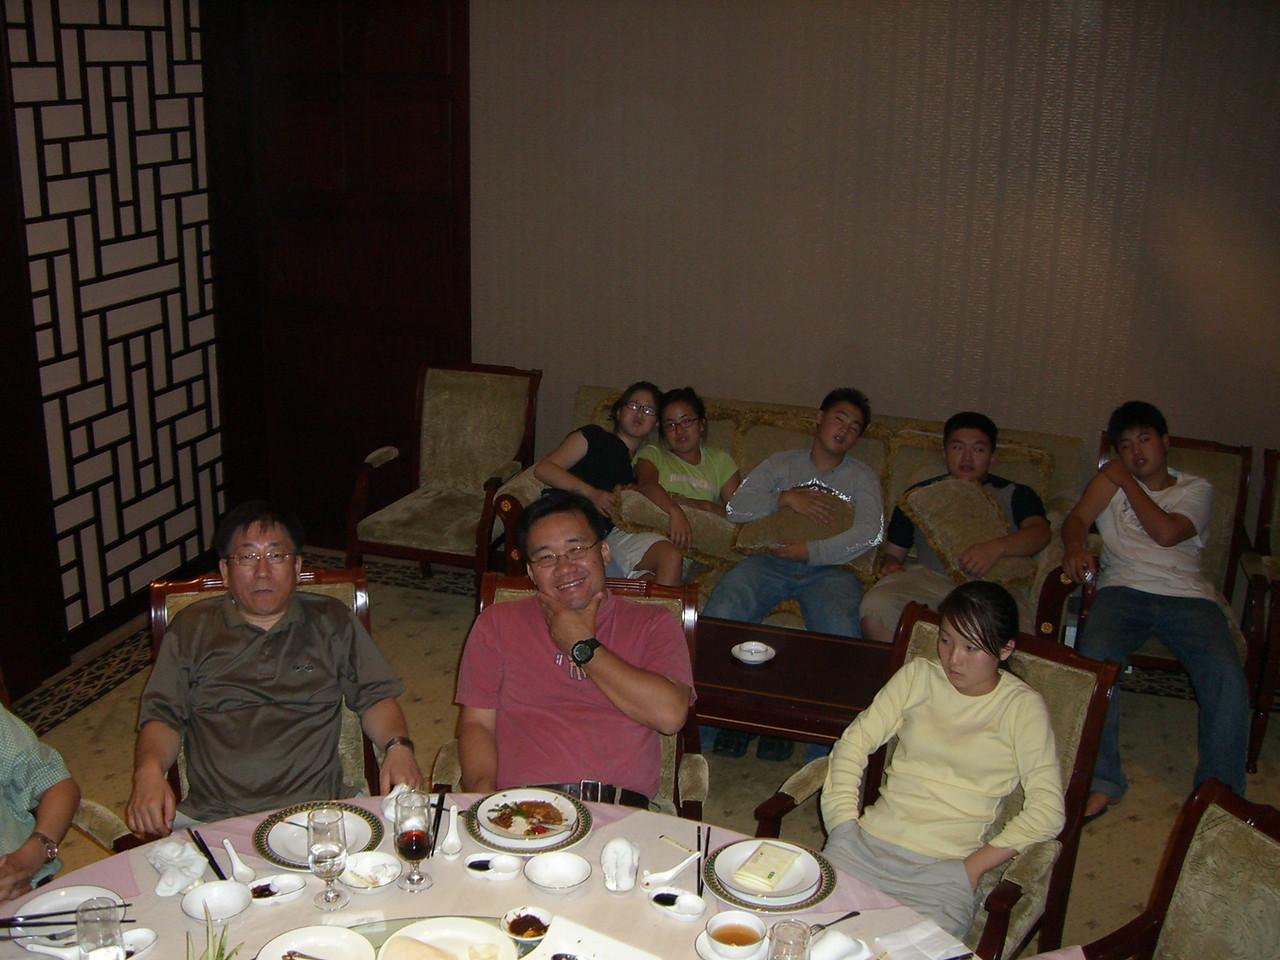 2006 07 14 Fri - Private banquet room 3 - stuffed